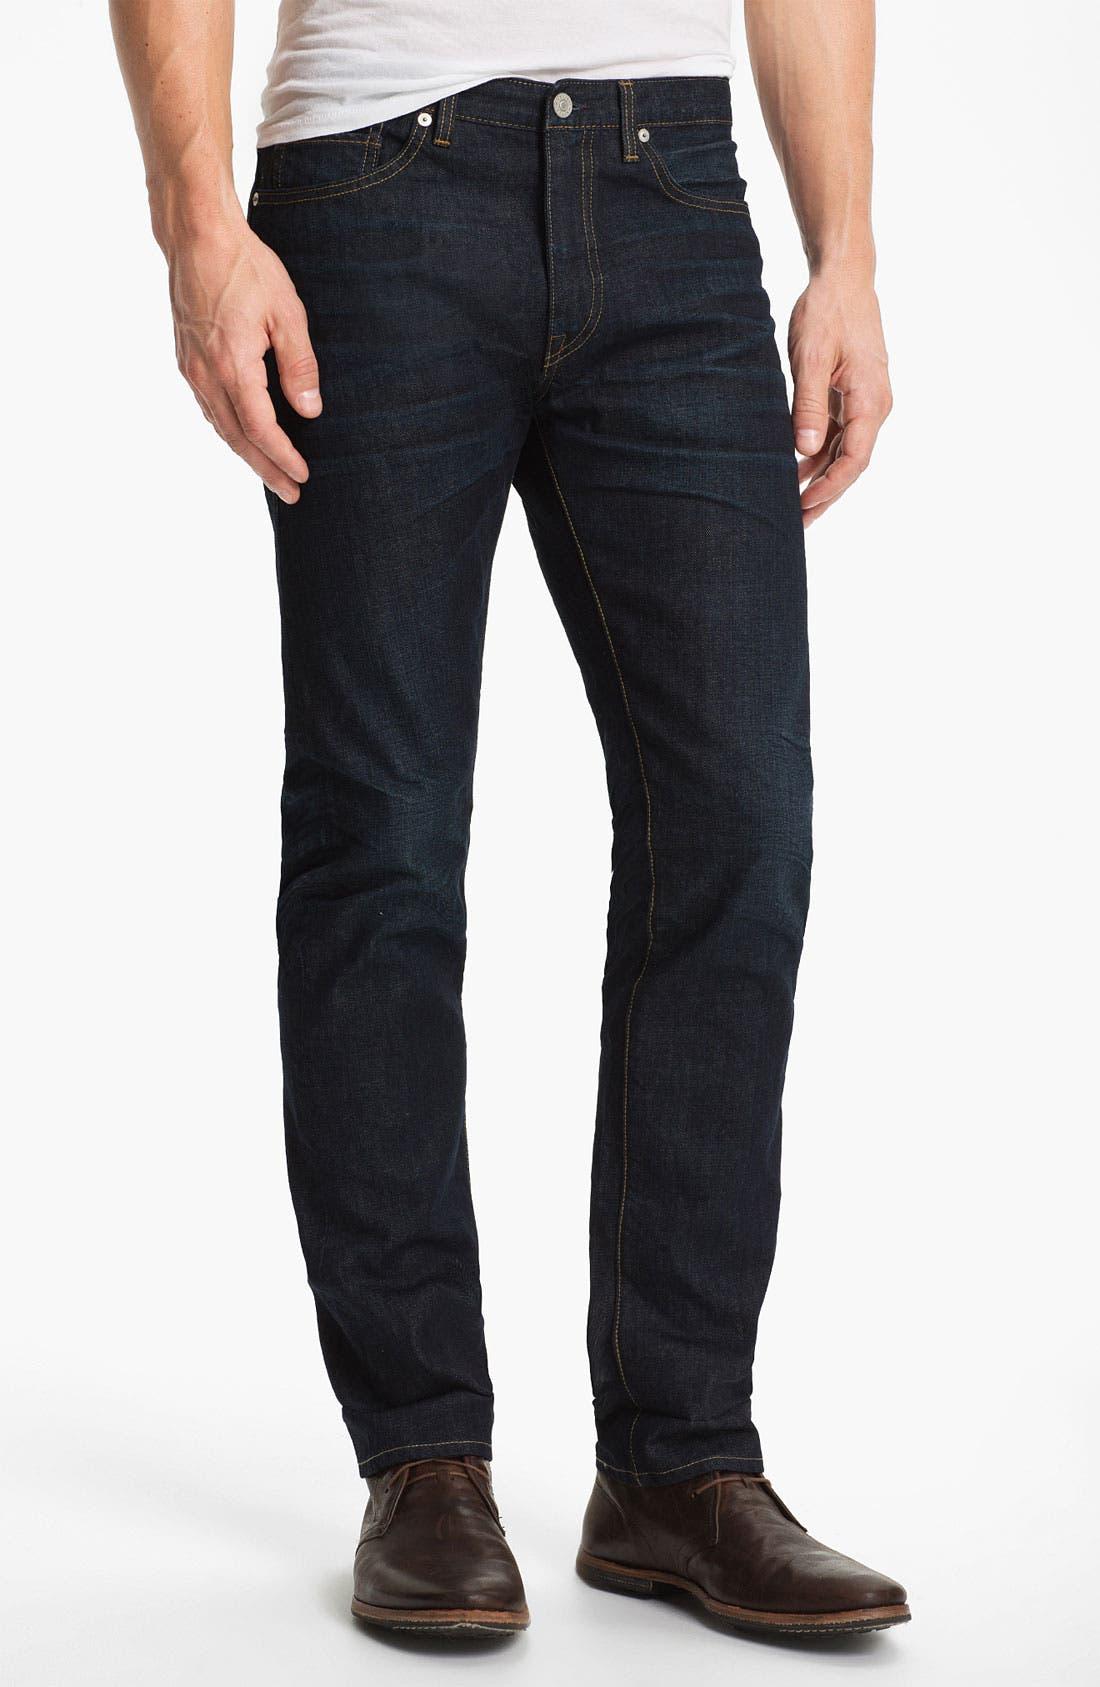 Alternate Image 1 Selected - Levi's® Made & Crafted™ Slim Leg Jeans (Nova)